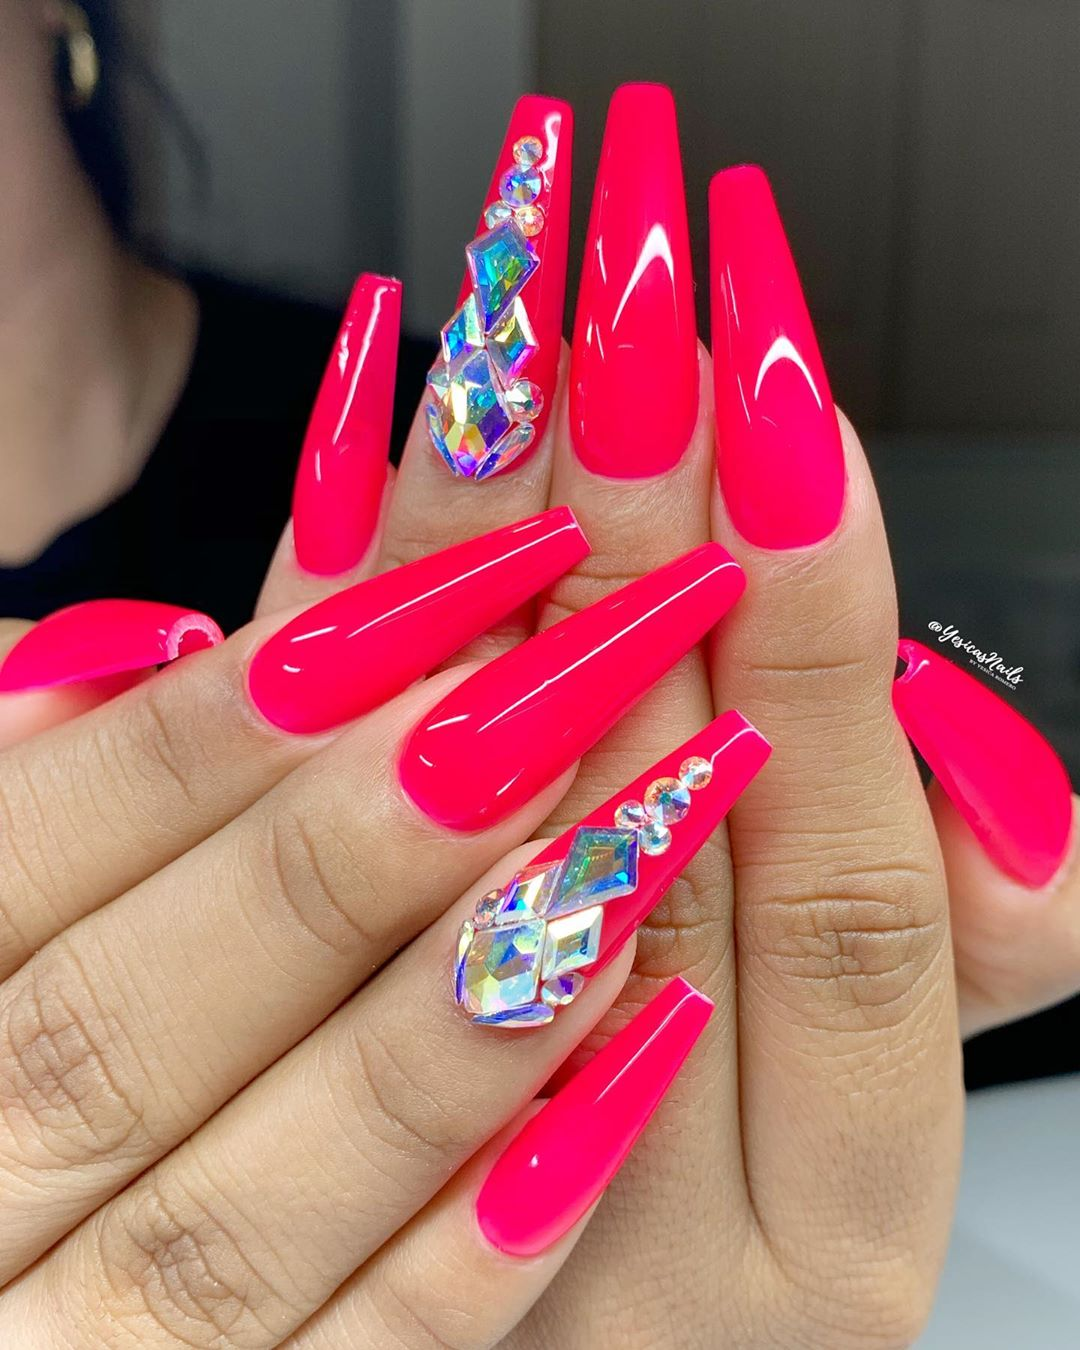 Hot pink coffin nail designs